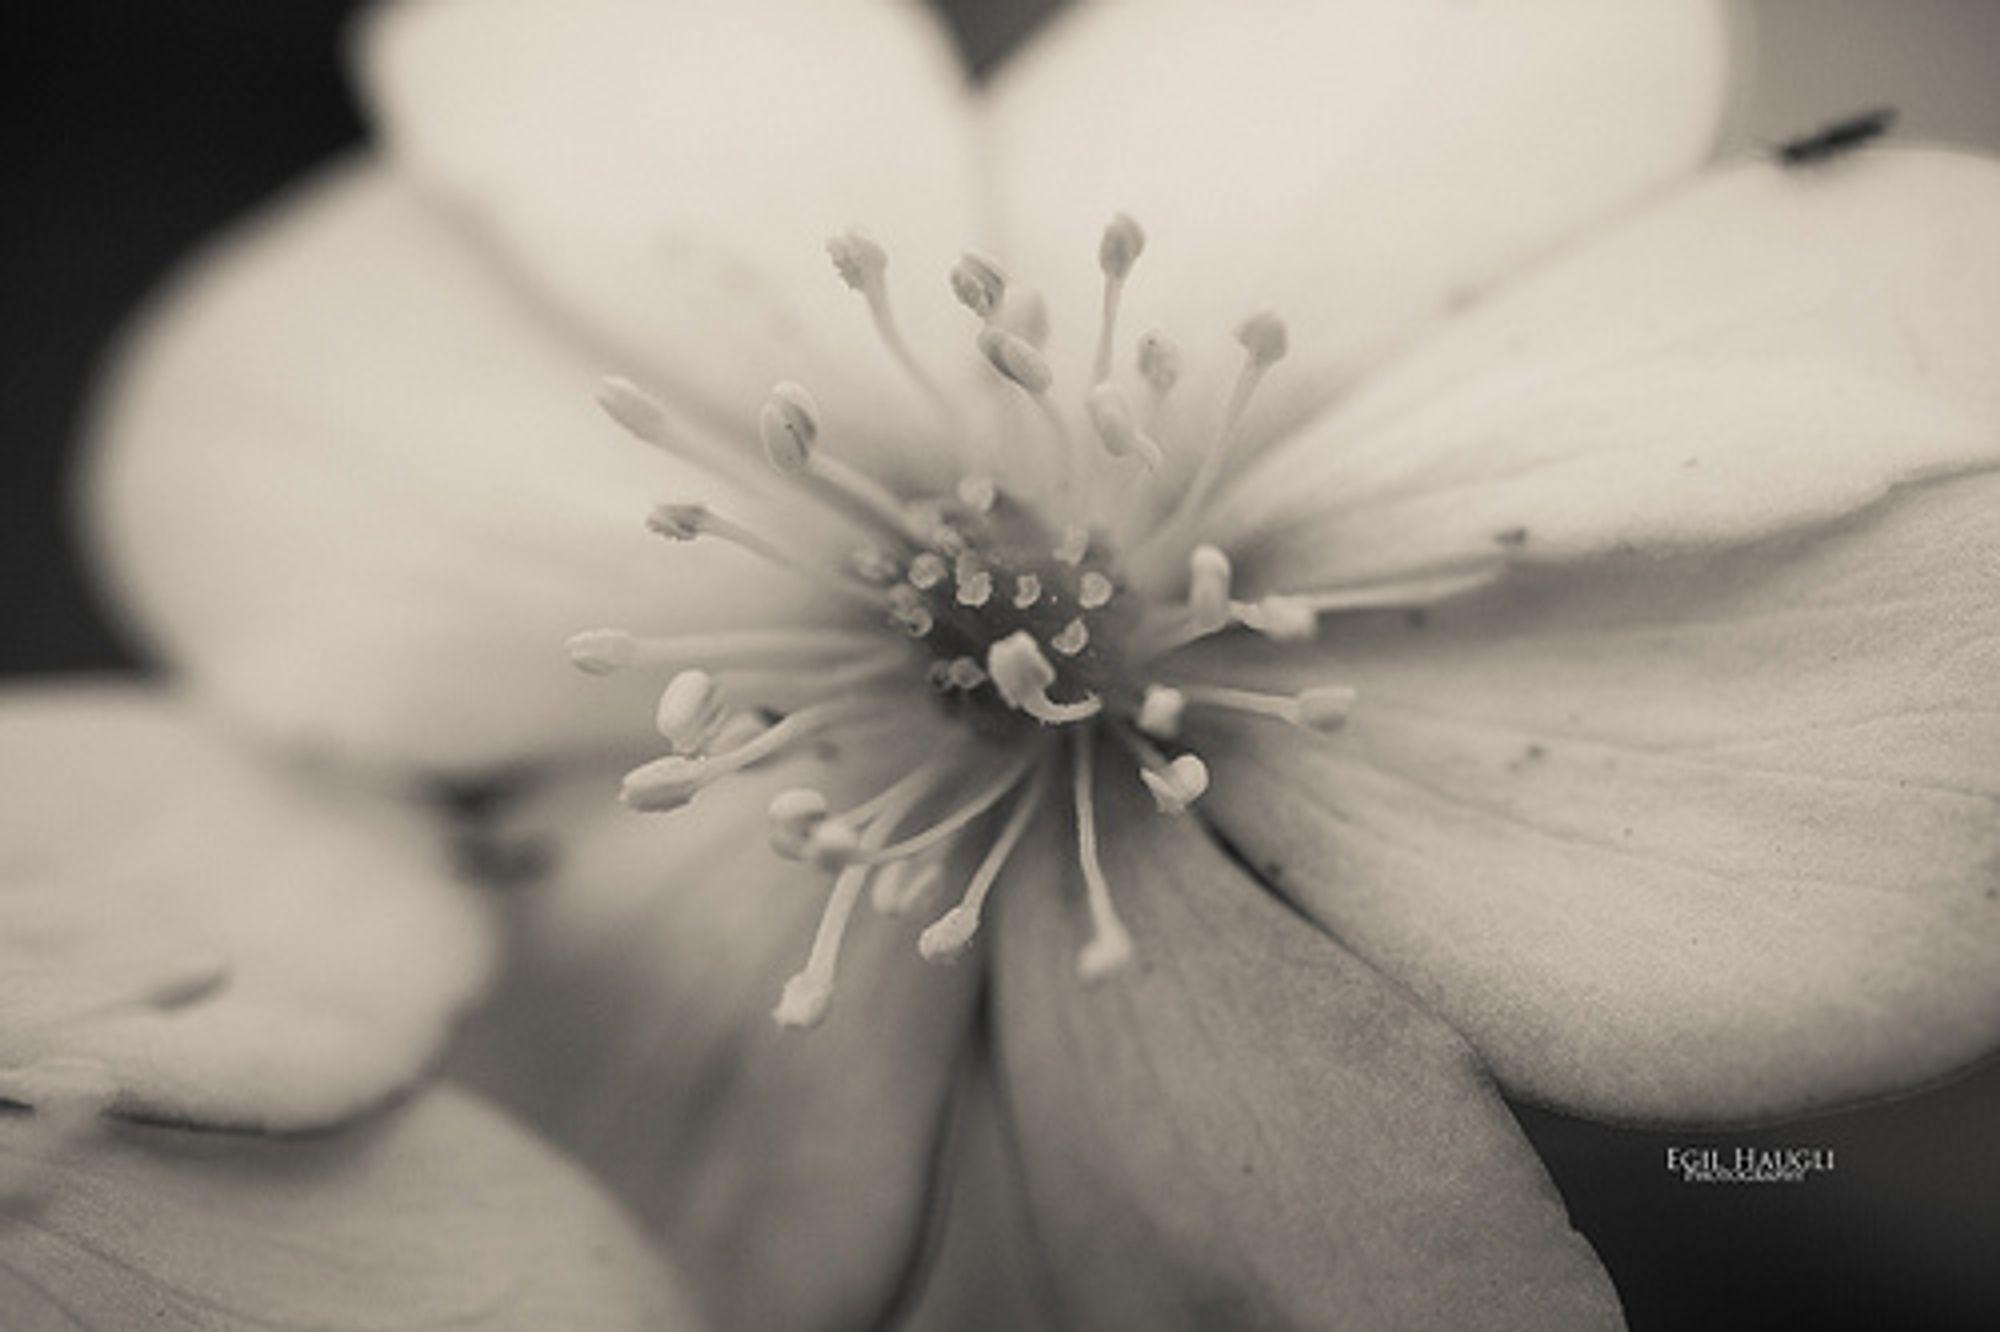 Foto: egilrs